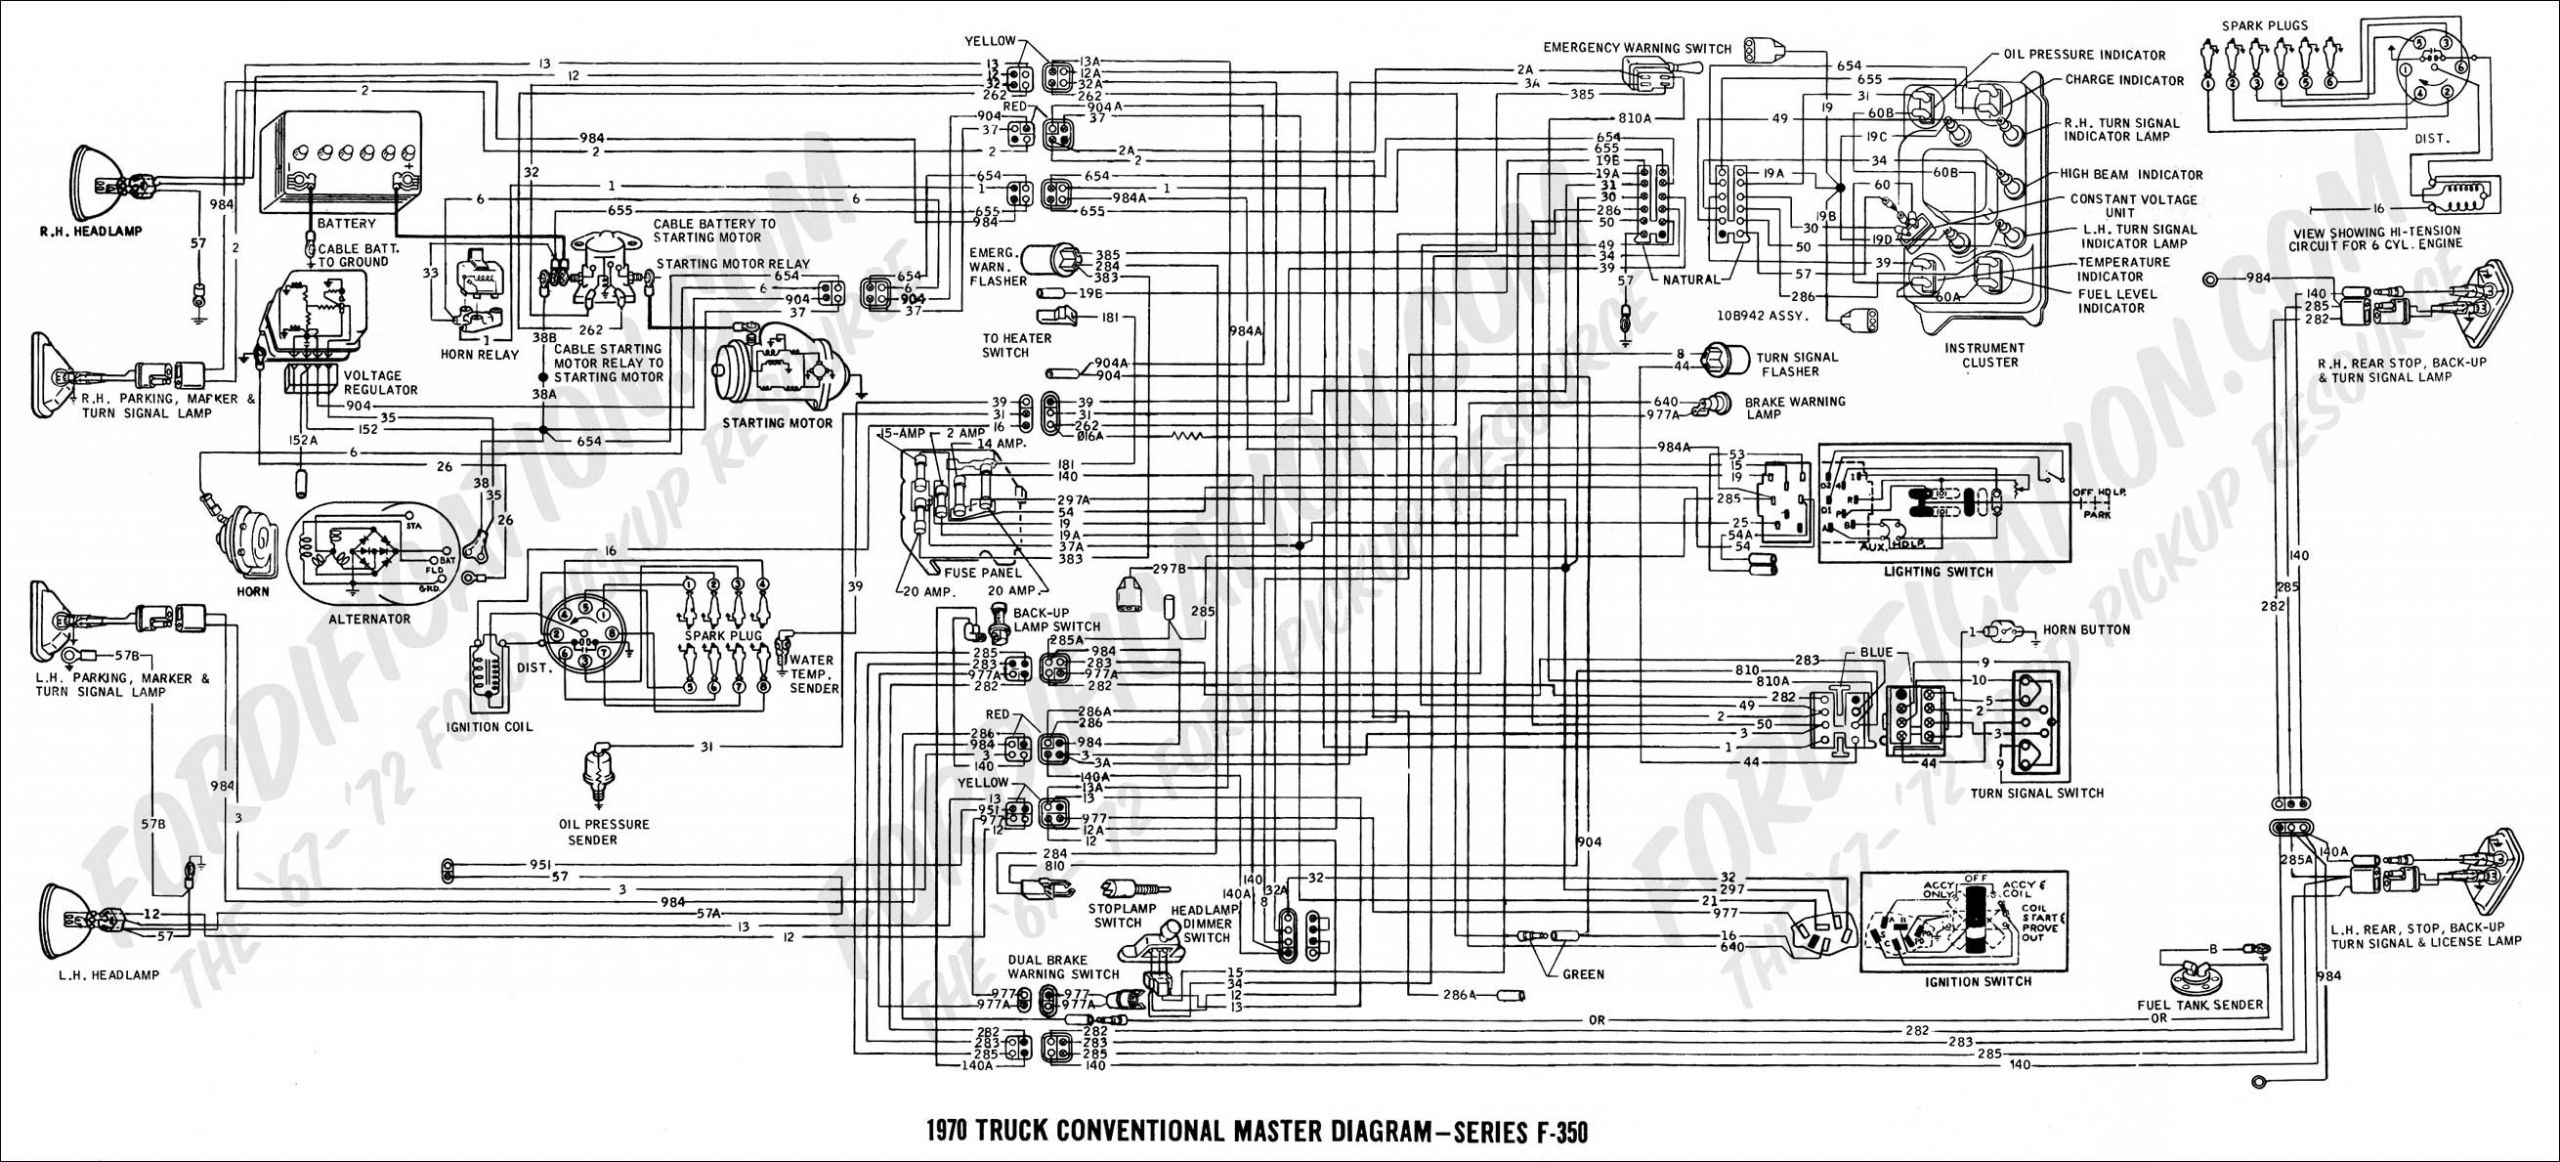 2005 F350 Tail Light Wiring Diagram 2005 F350 Trailer Wiring Diagram Of 2005 F350 Tail Light Wiring Diagram